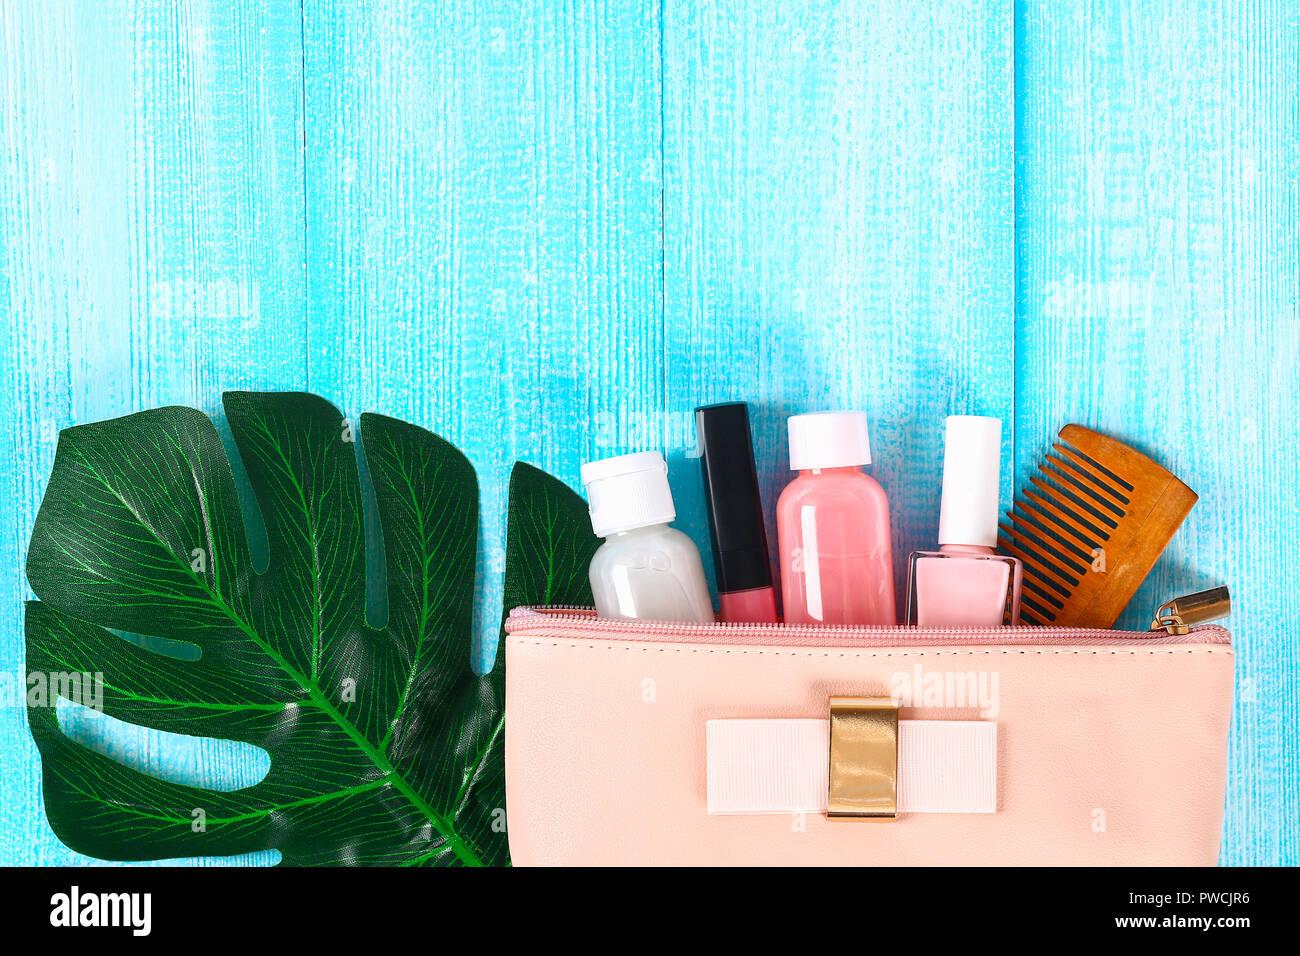 Kosmetik In Einem Rosa Kosmetiktasche Lip Gloss Sahne Nagellack